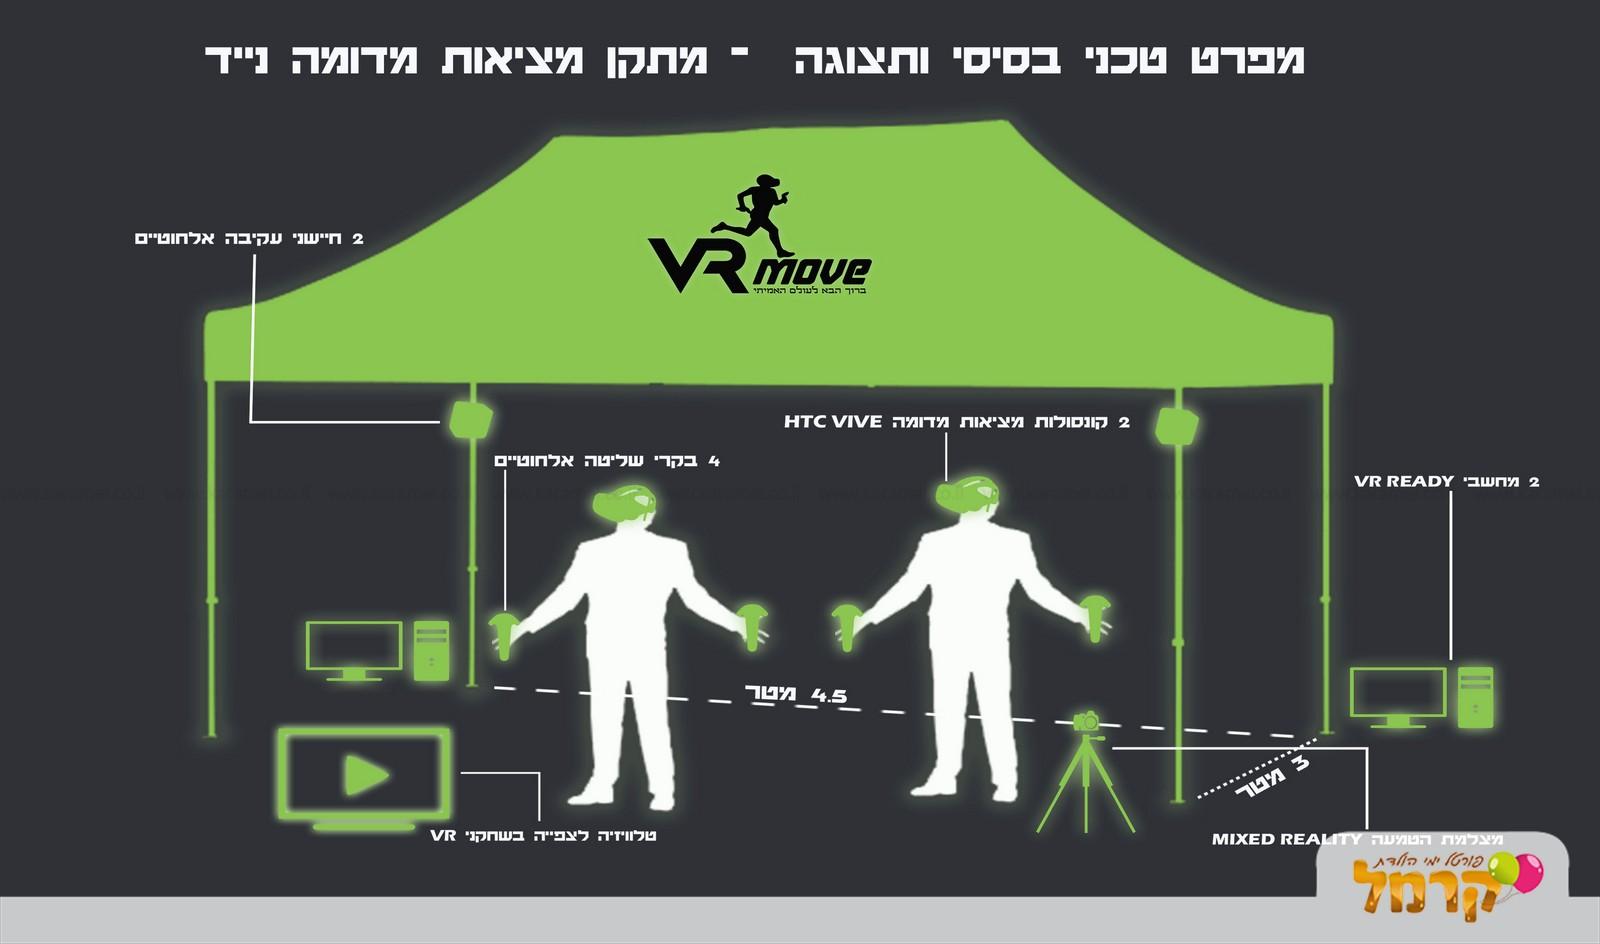 VR Move לחיות את המשחק - 073-7027530